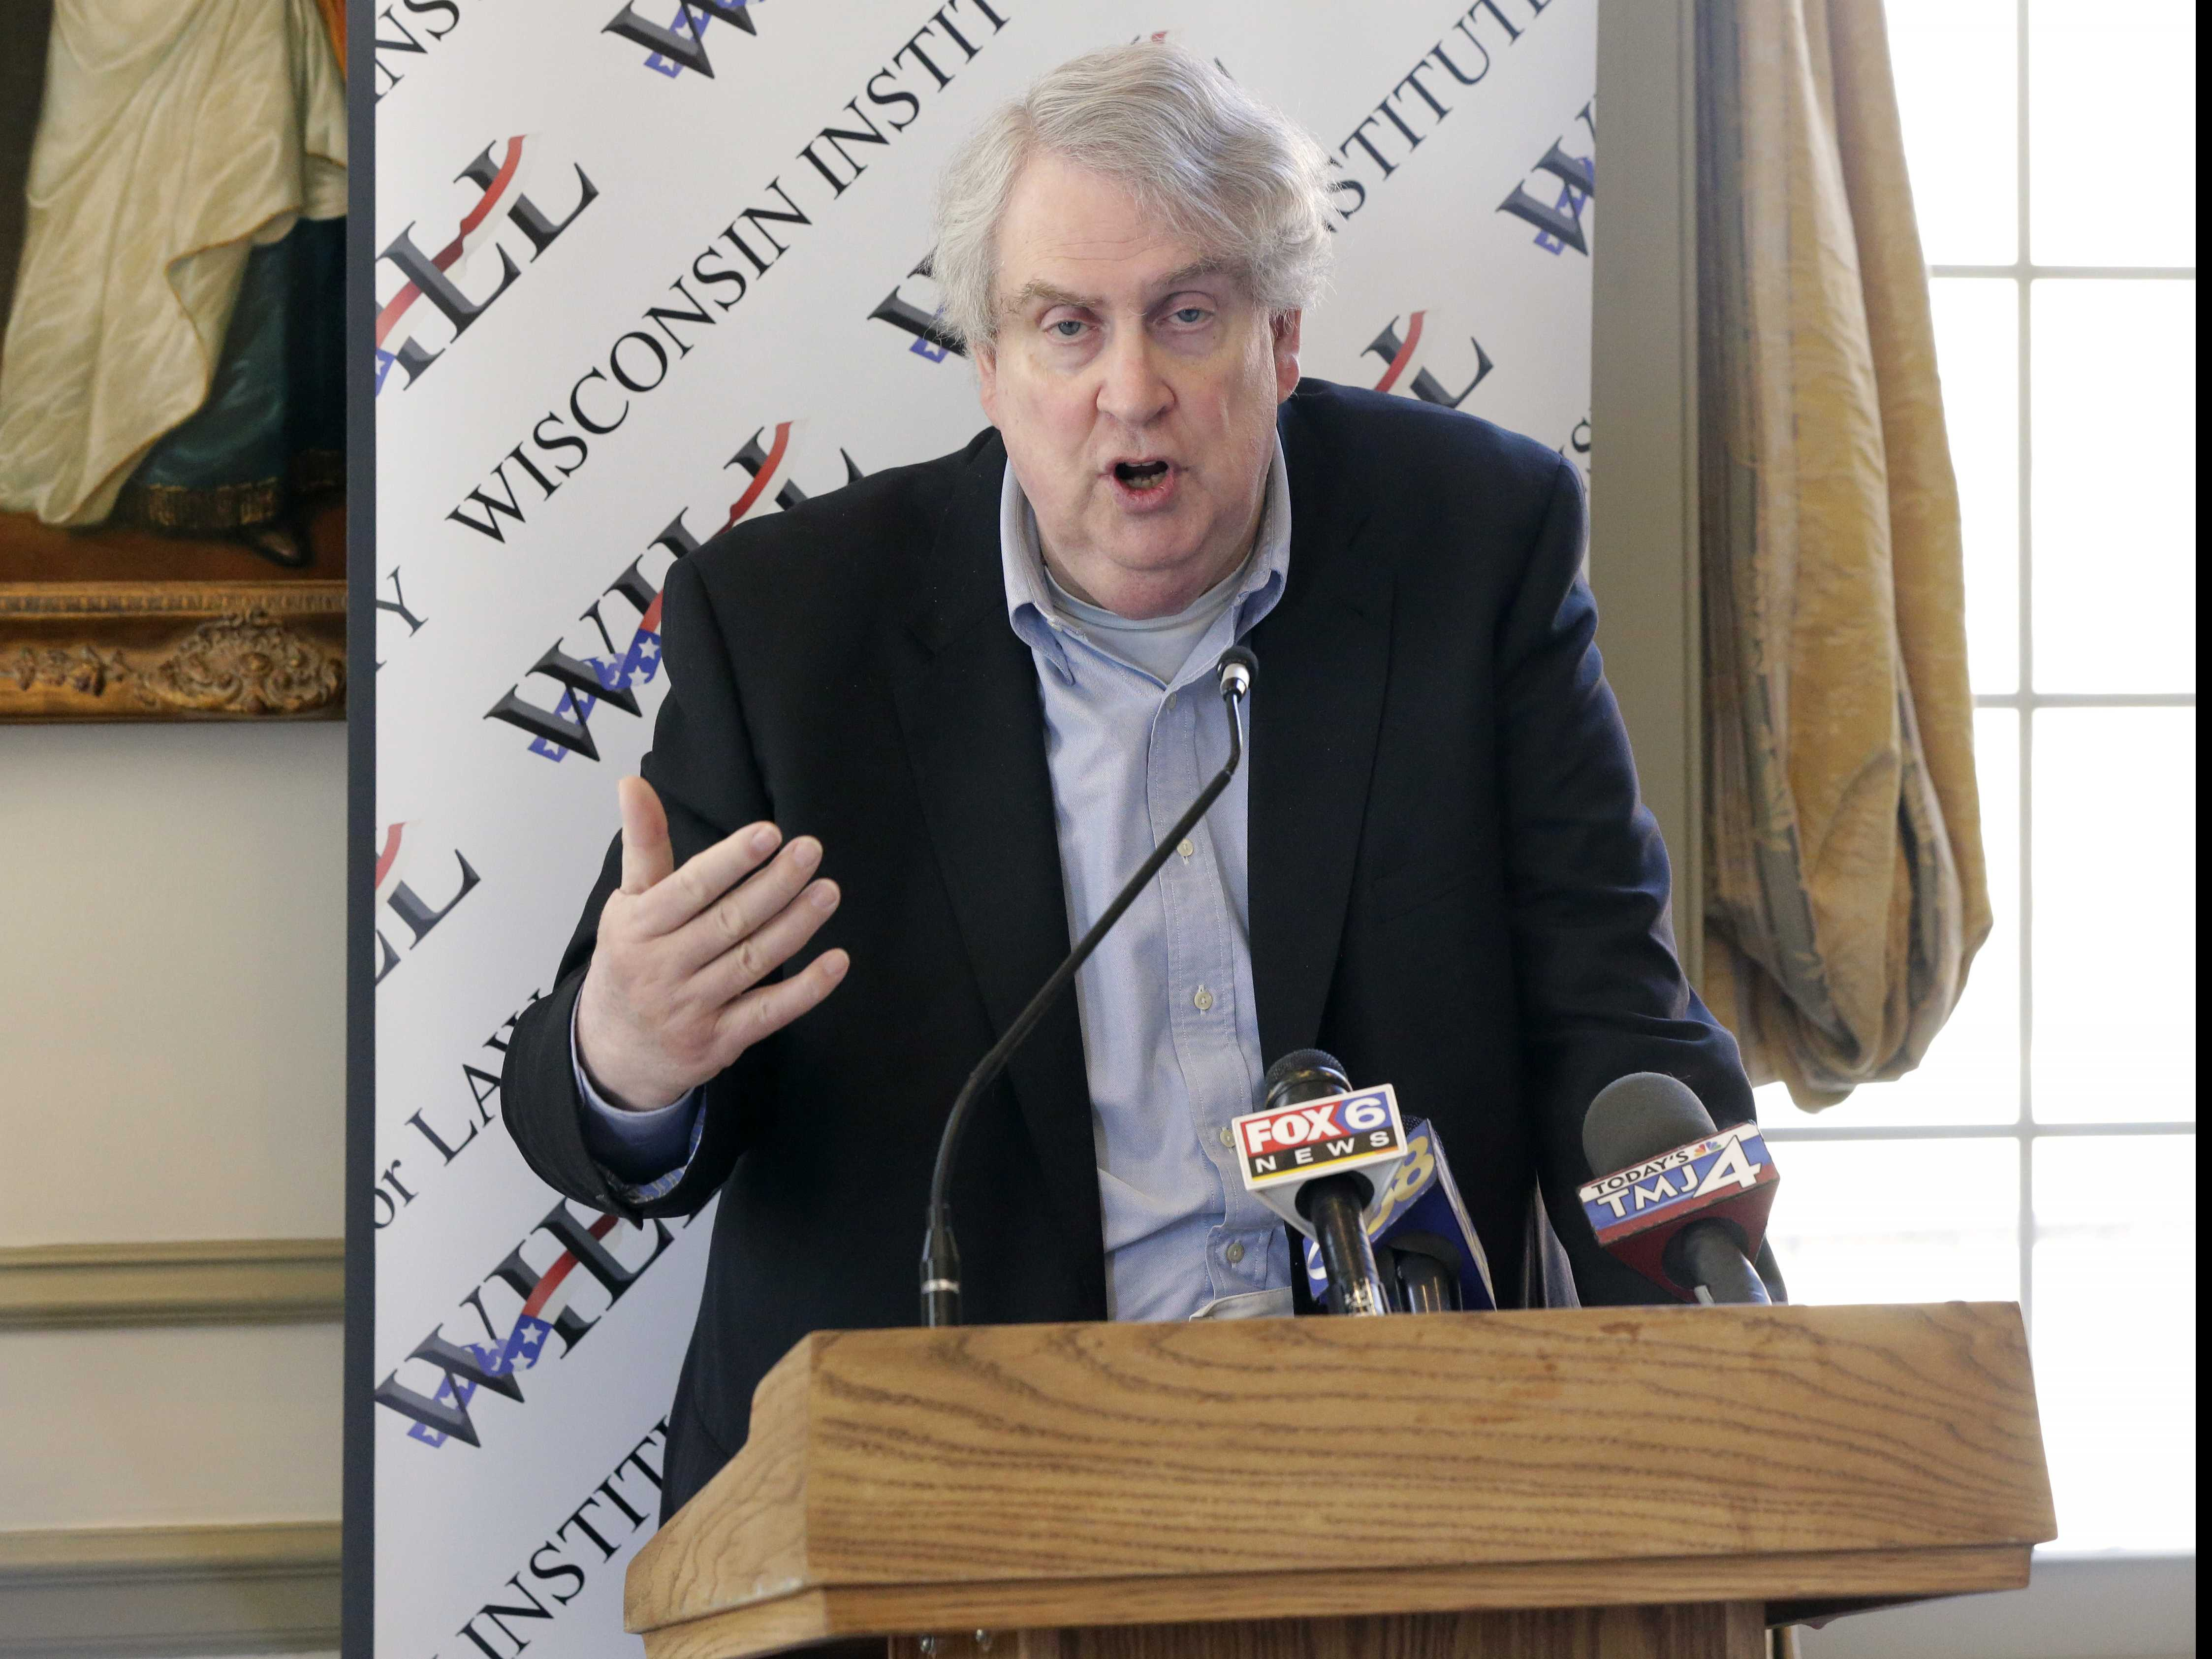 Wisconsin Professor Says Firing Shows Anti-Conservative Bias